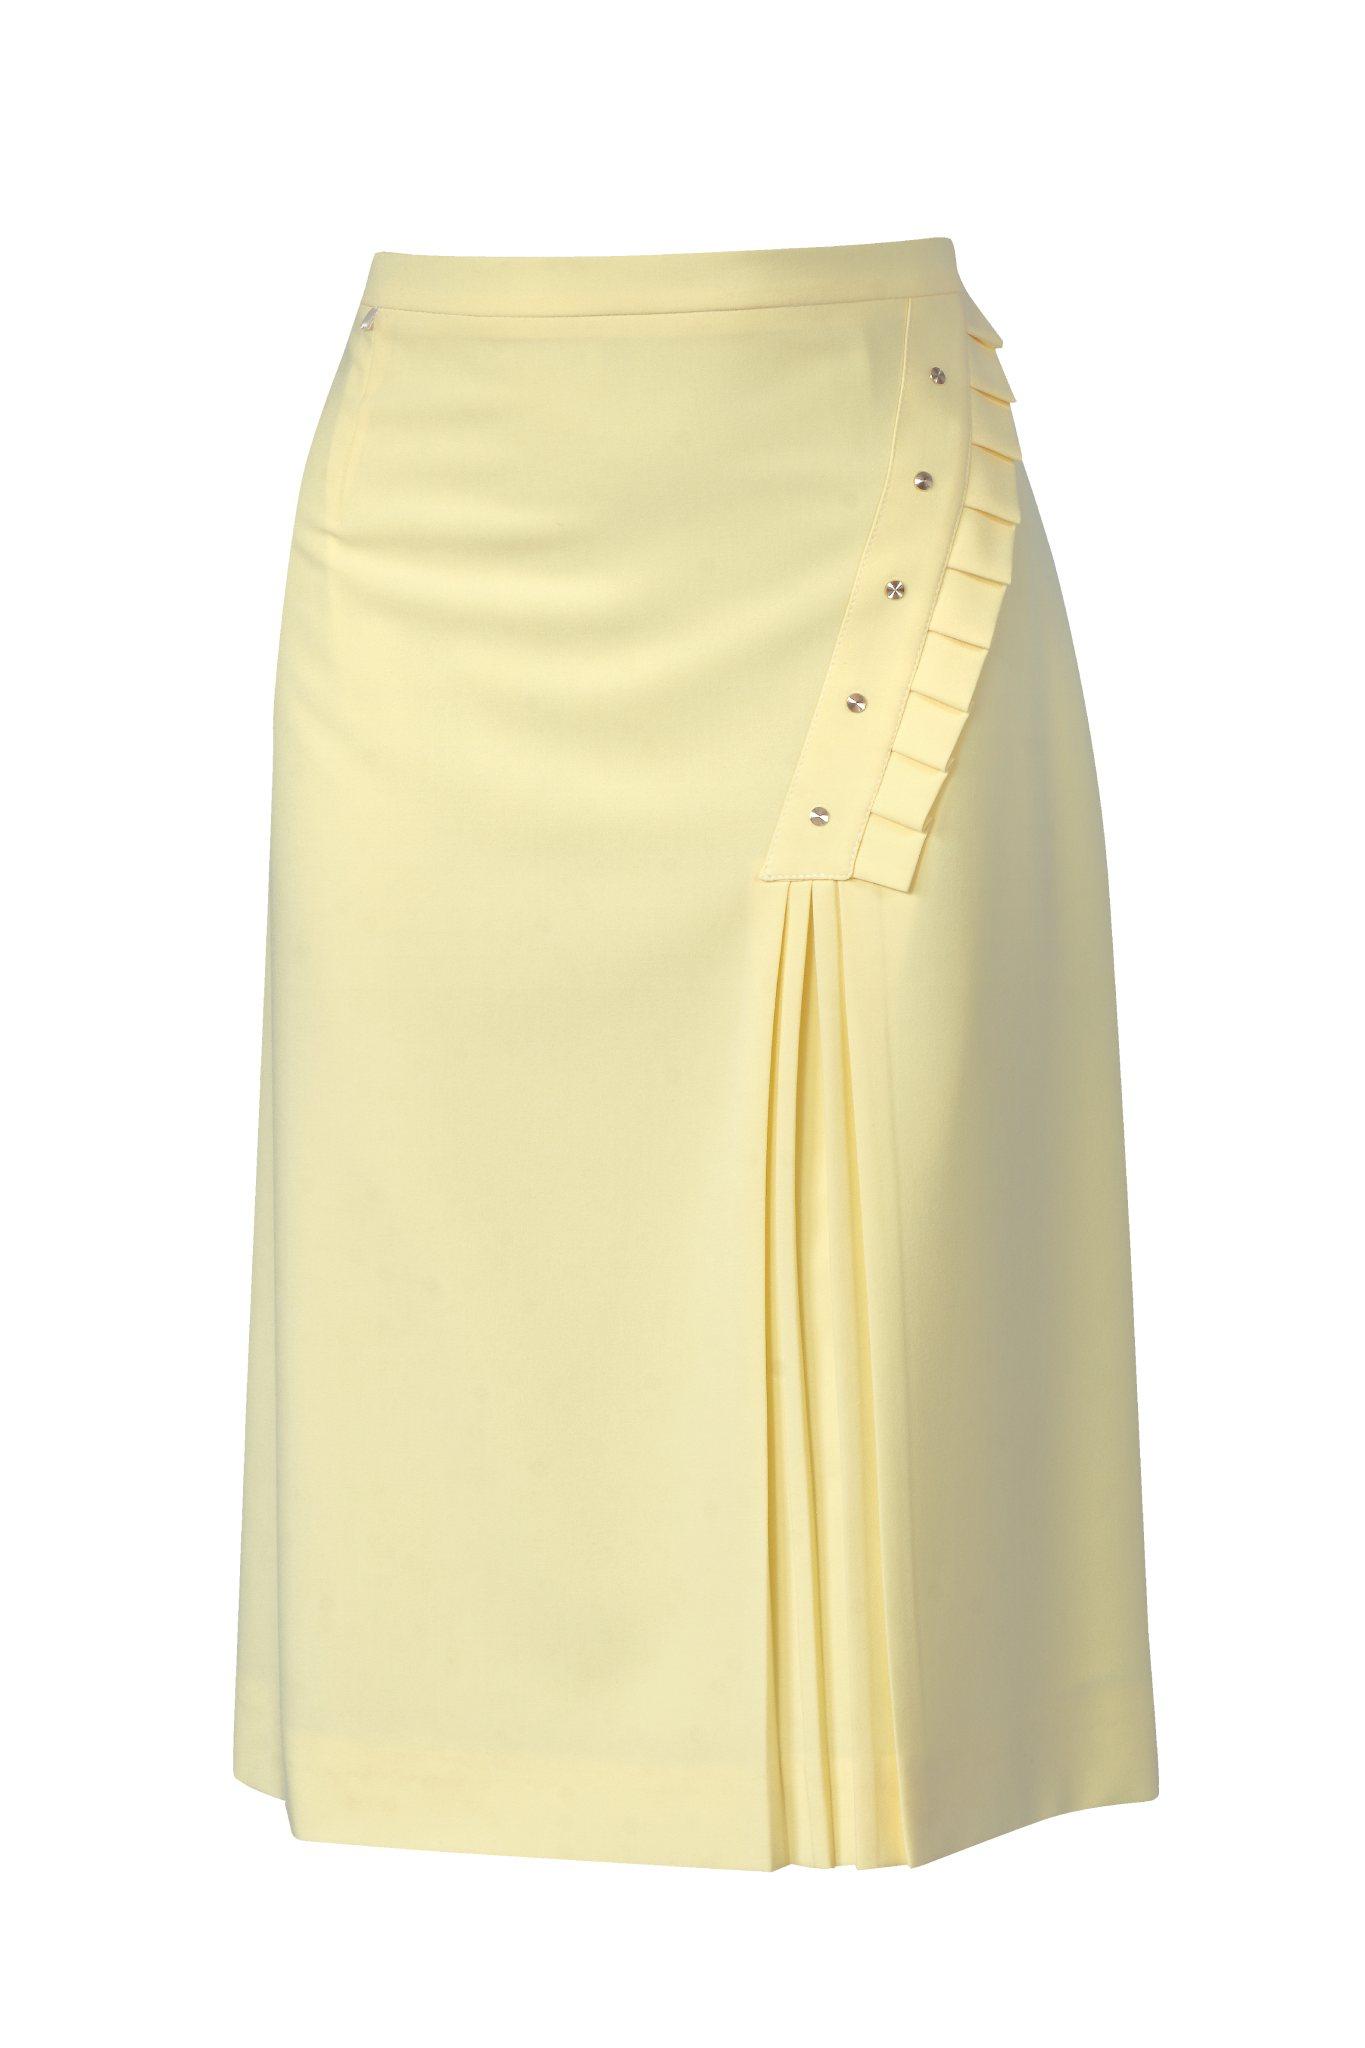 1115 Jumitex spodnica z plisa